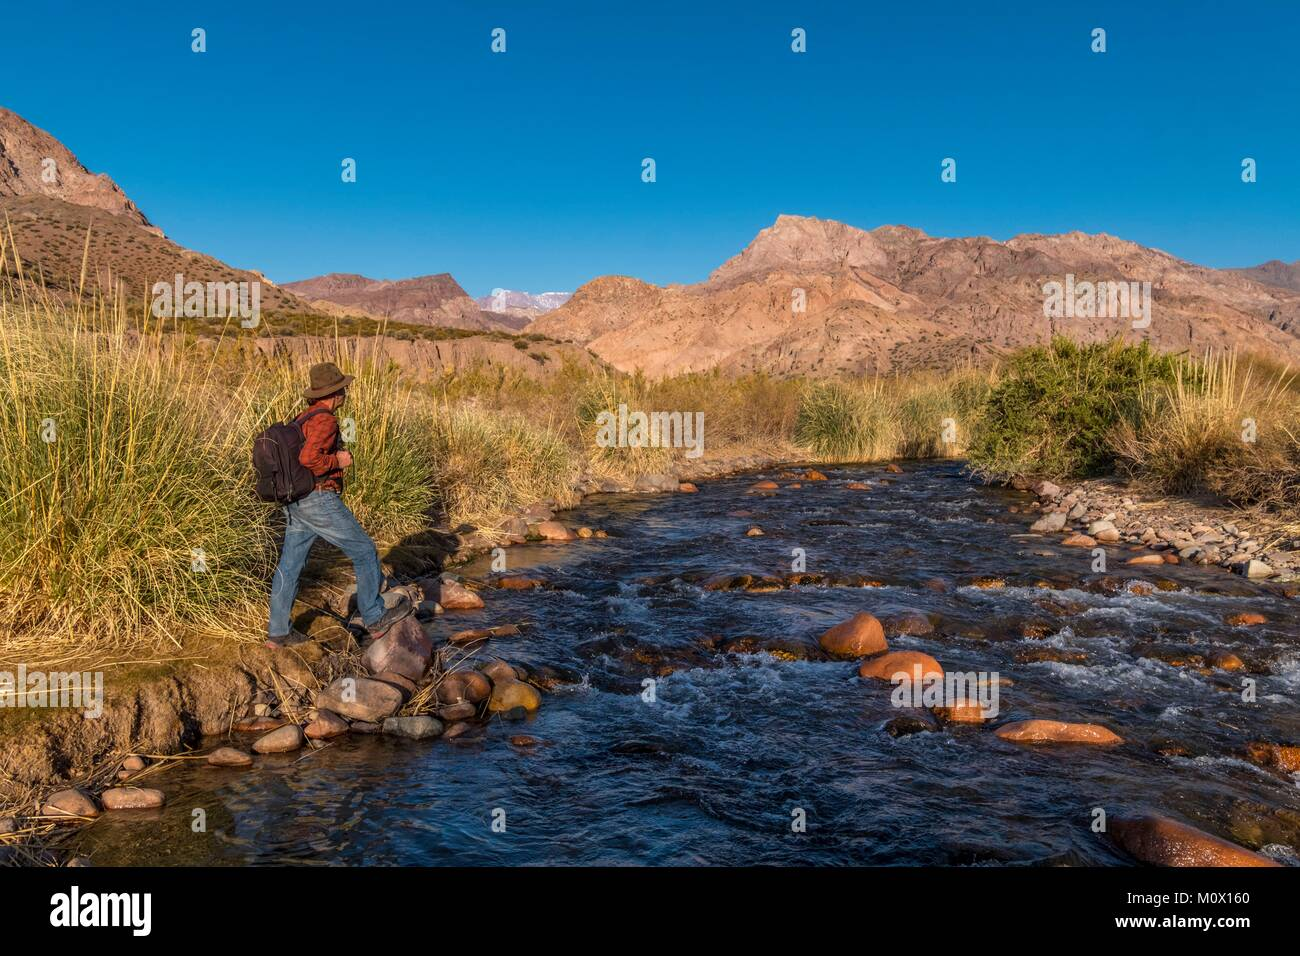 Argentina, provincia de San Juan, Calingasta,Río Valle de Calingasta Imagen De Stock